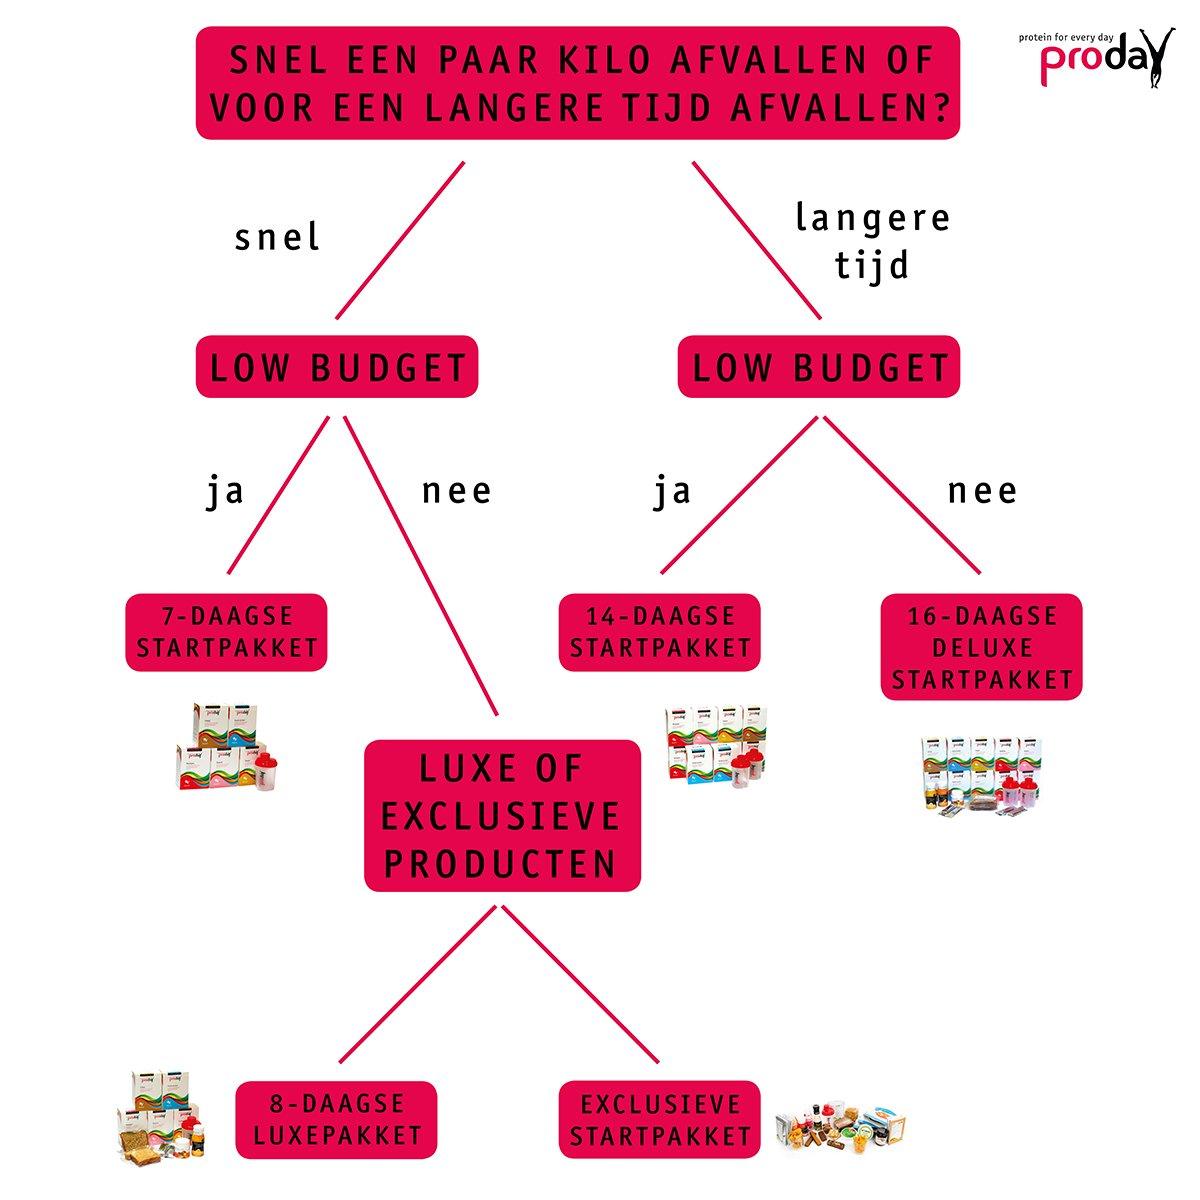 Proday startpakket infographic